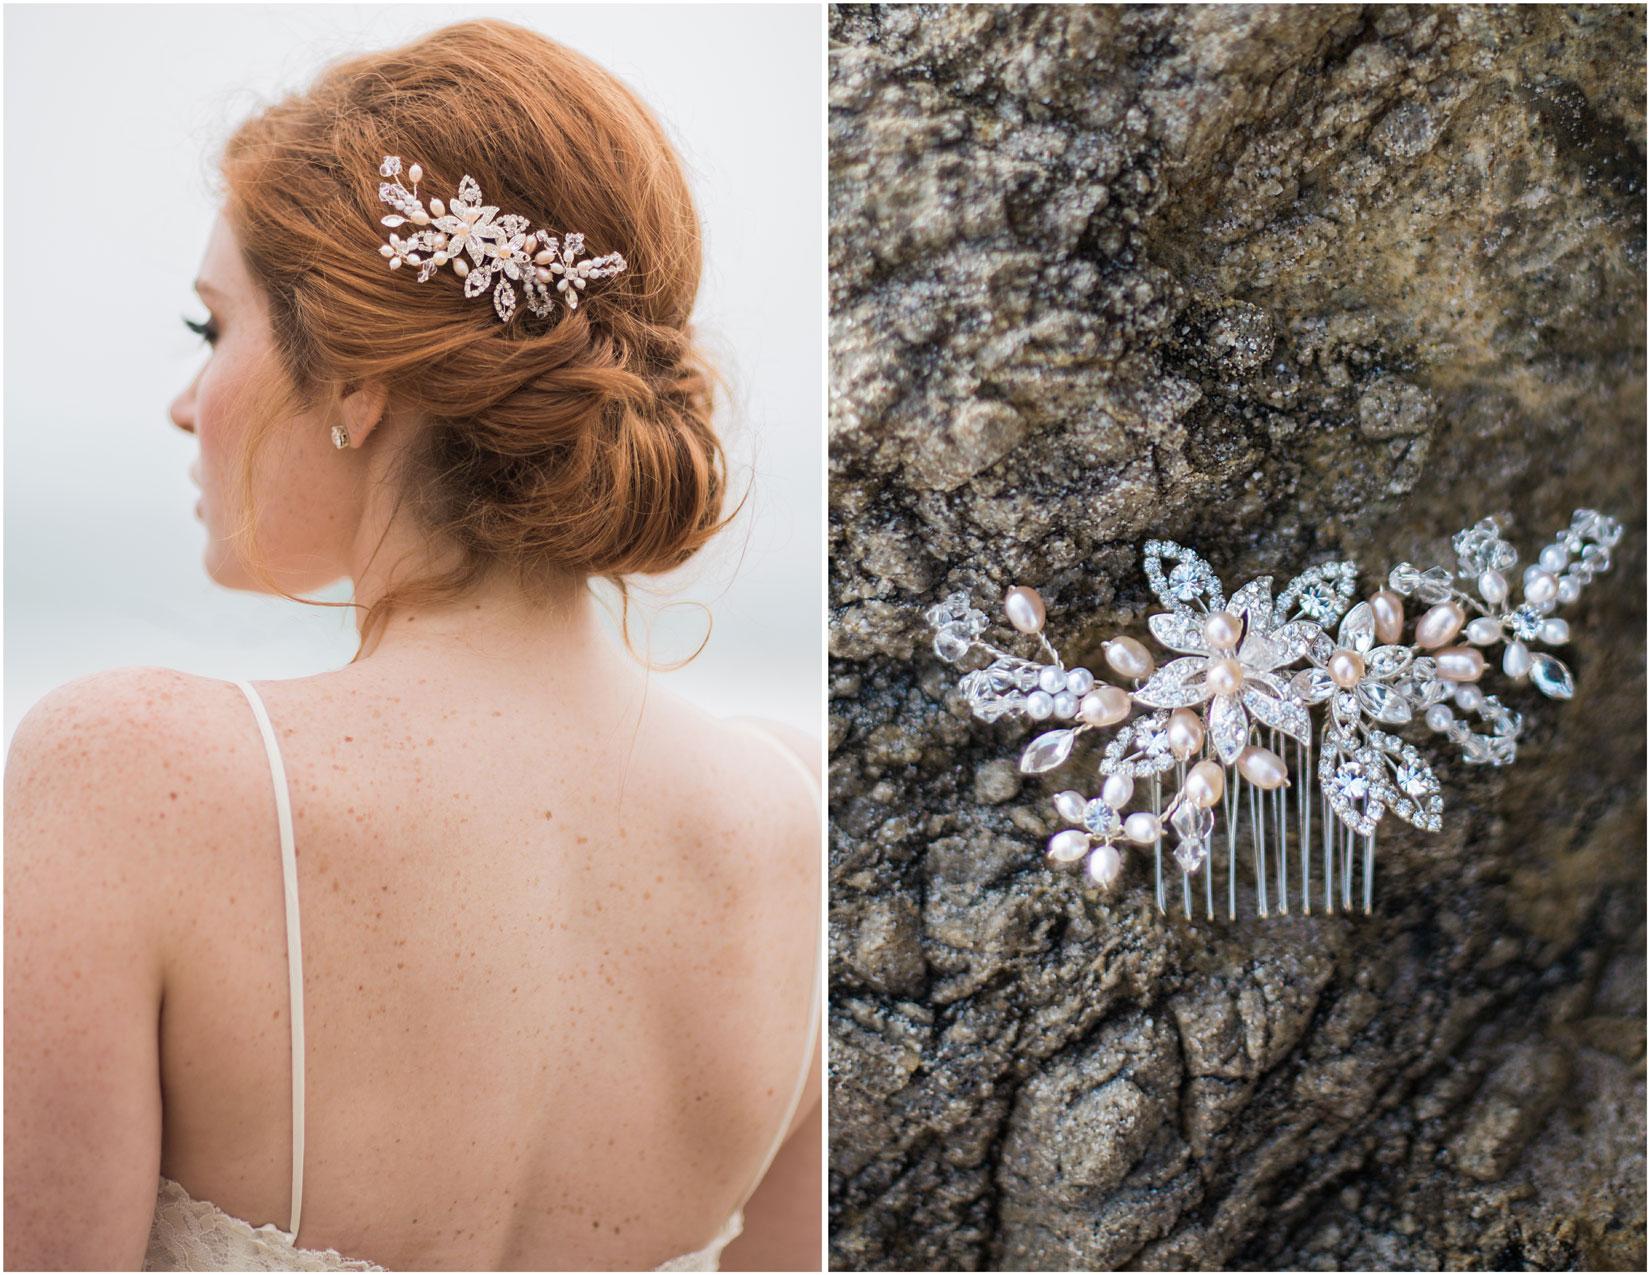 Bel-Aire-Bridal-Jen-Fuj-Photography-6569